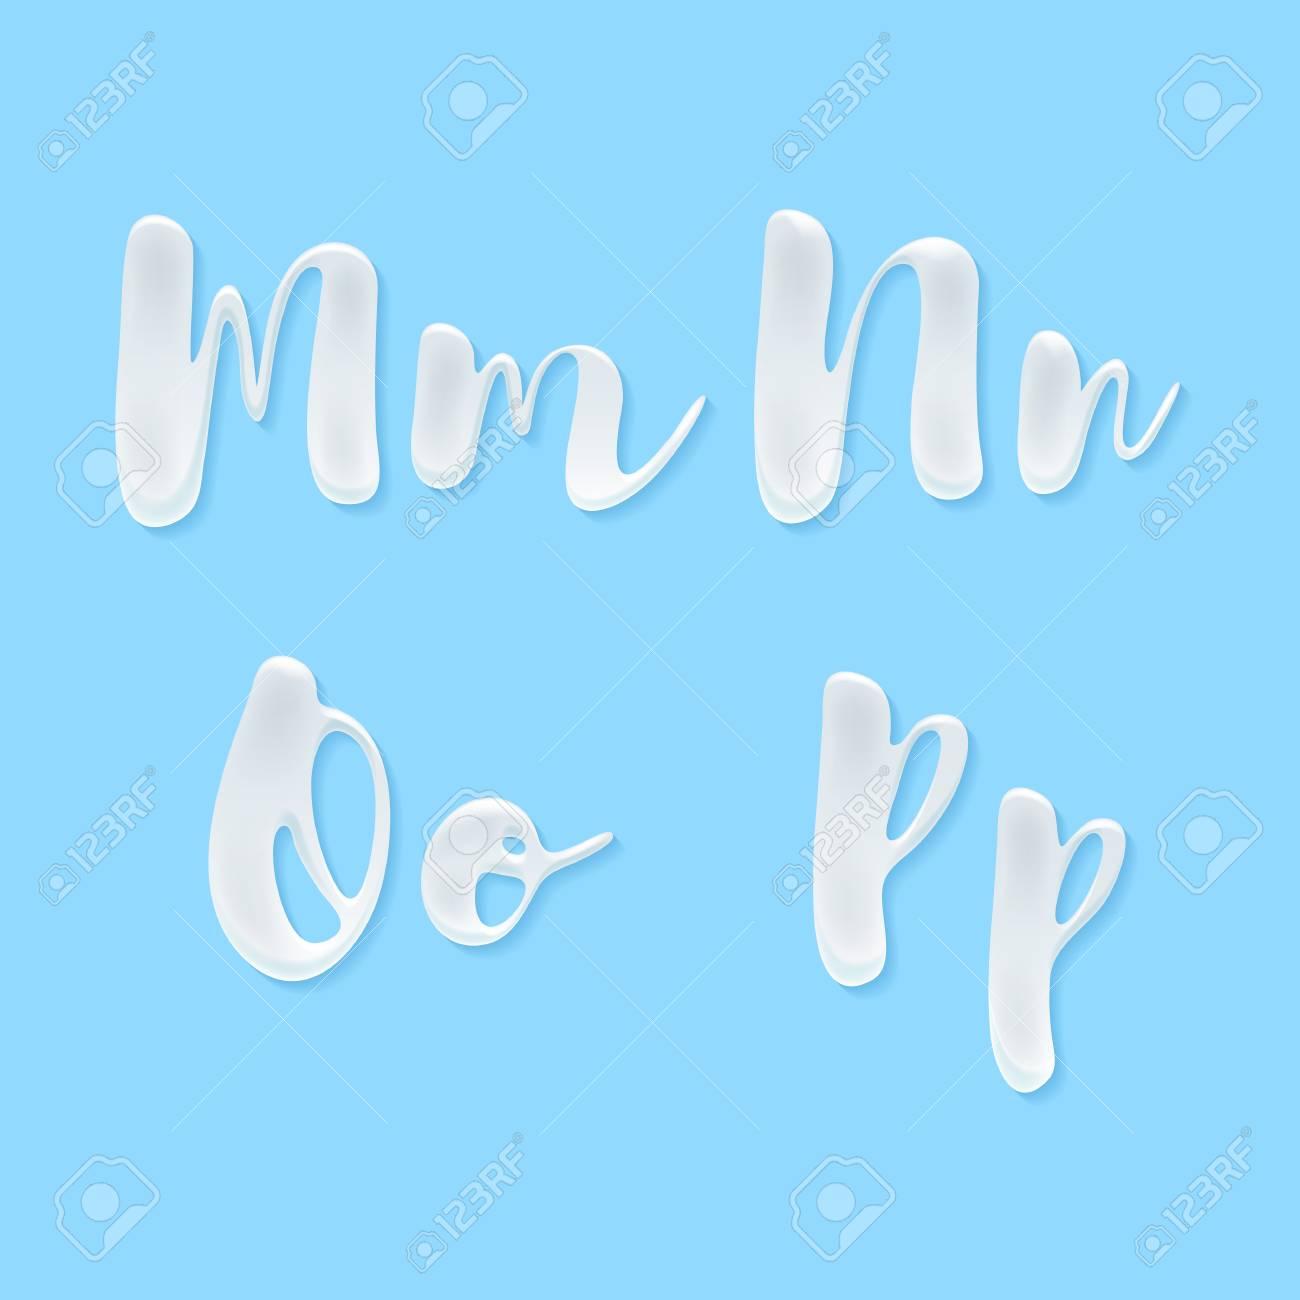 Milk, yogurt or cream abc letters set. White smudges splashes alphabet on blue background vector illustration. Good for poster banner advertising packaging design. - 59873173